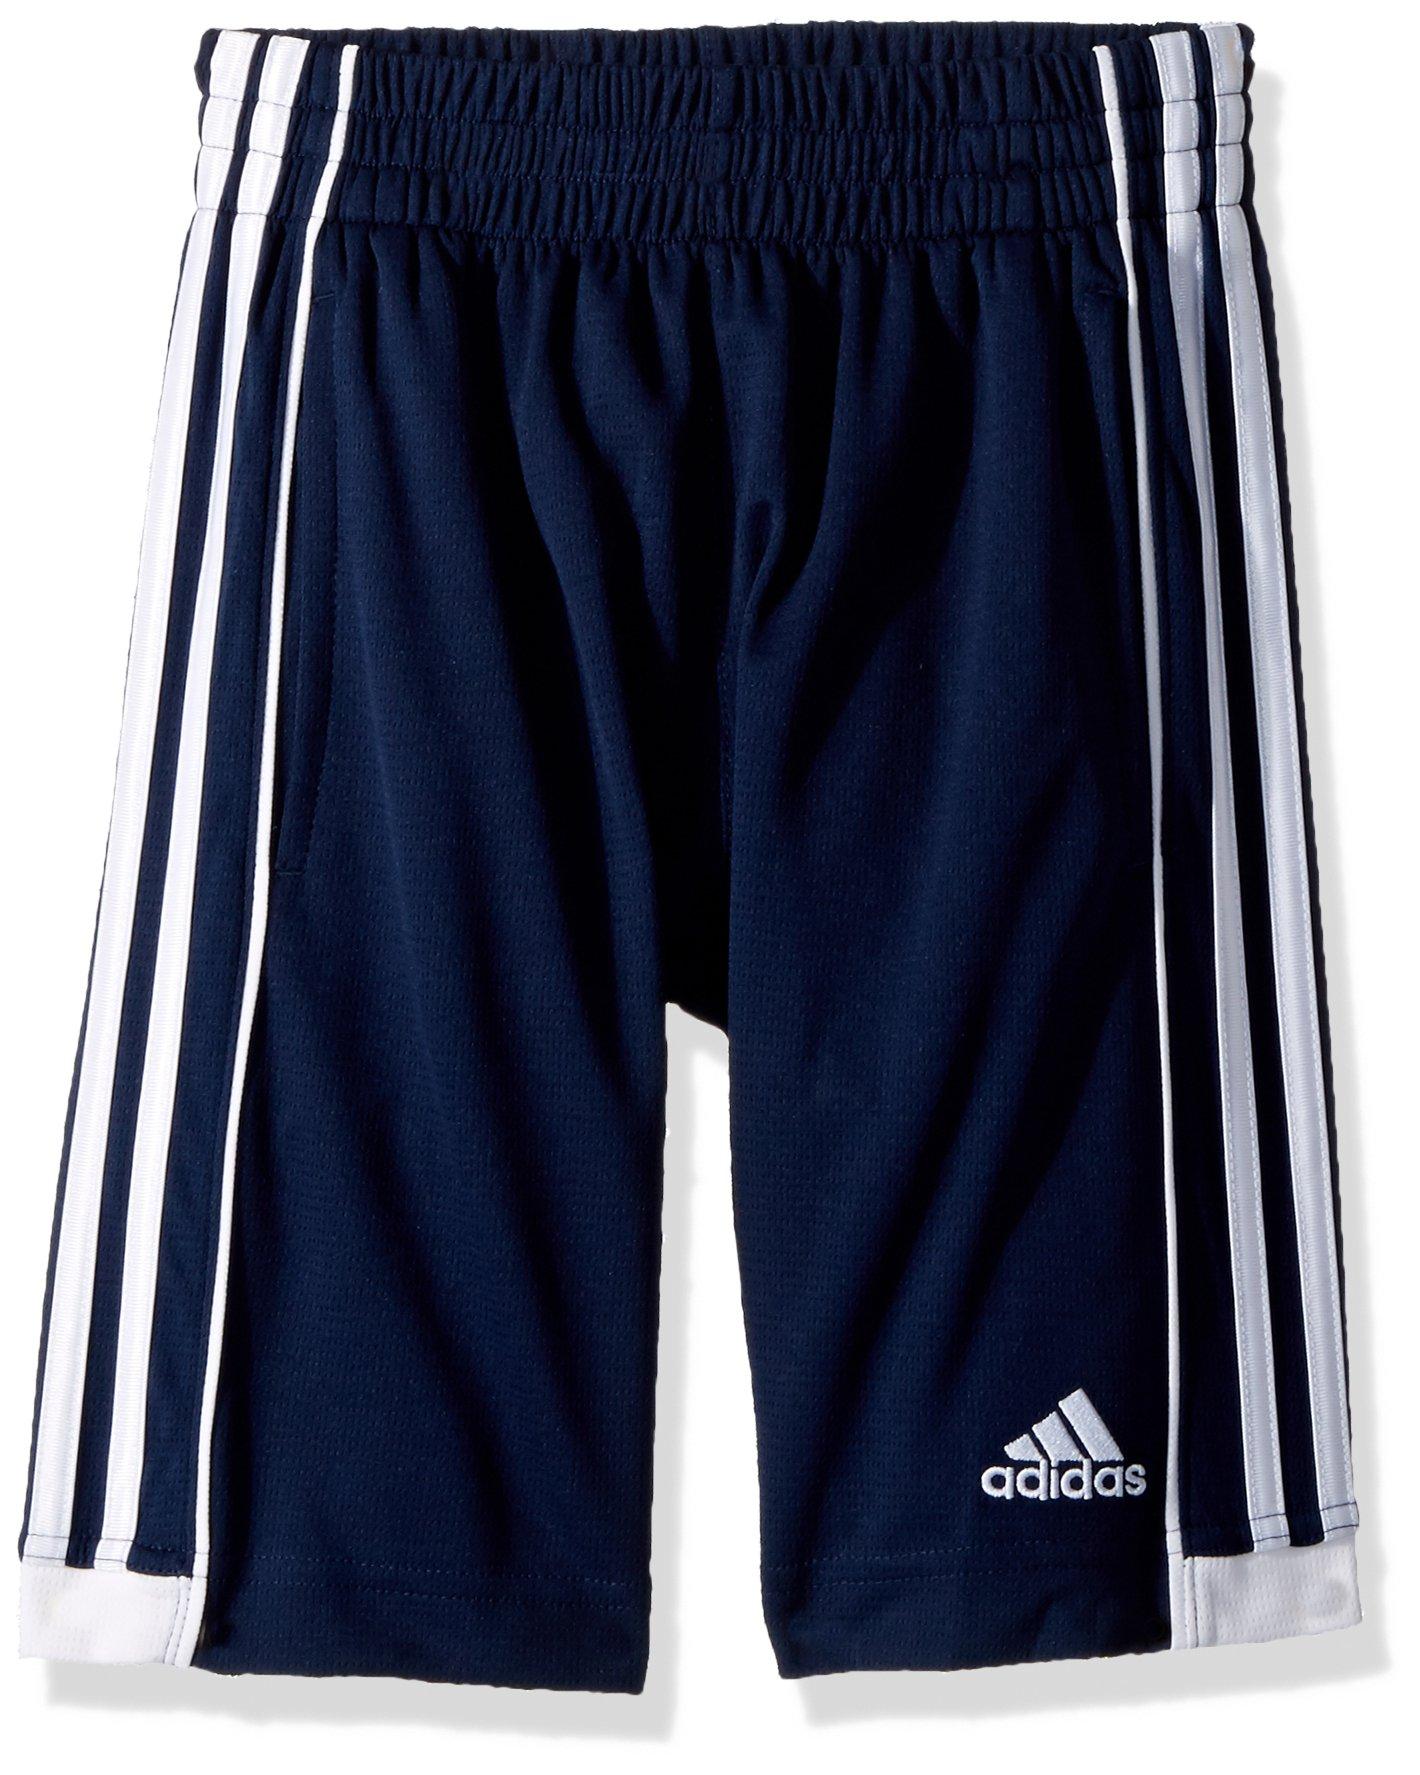 adidas Men's Big Boys' Yrc Speed 18 Short, Collegiate Navy, Small